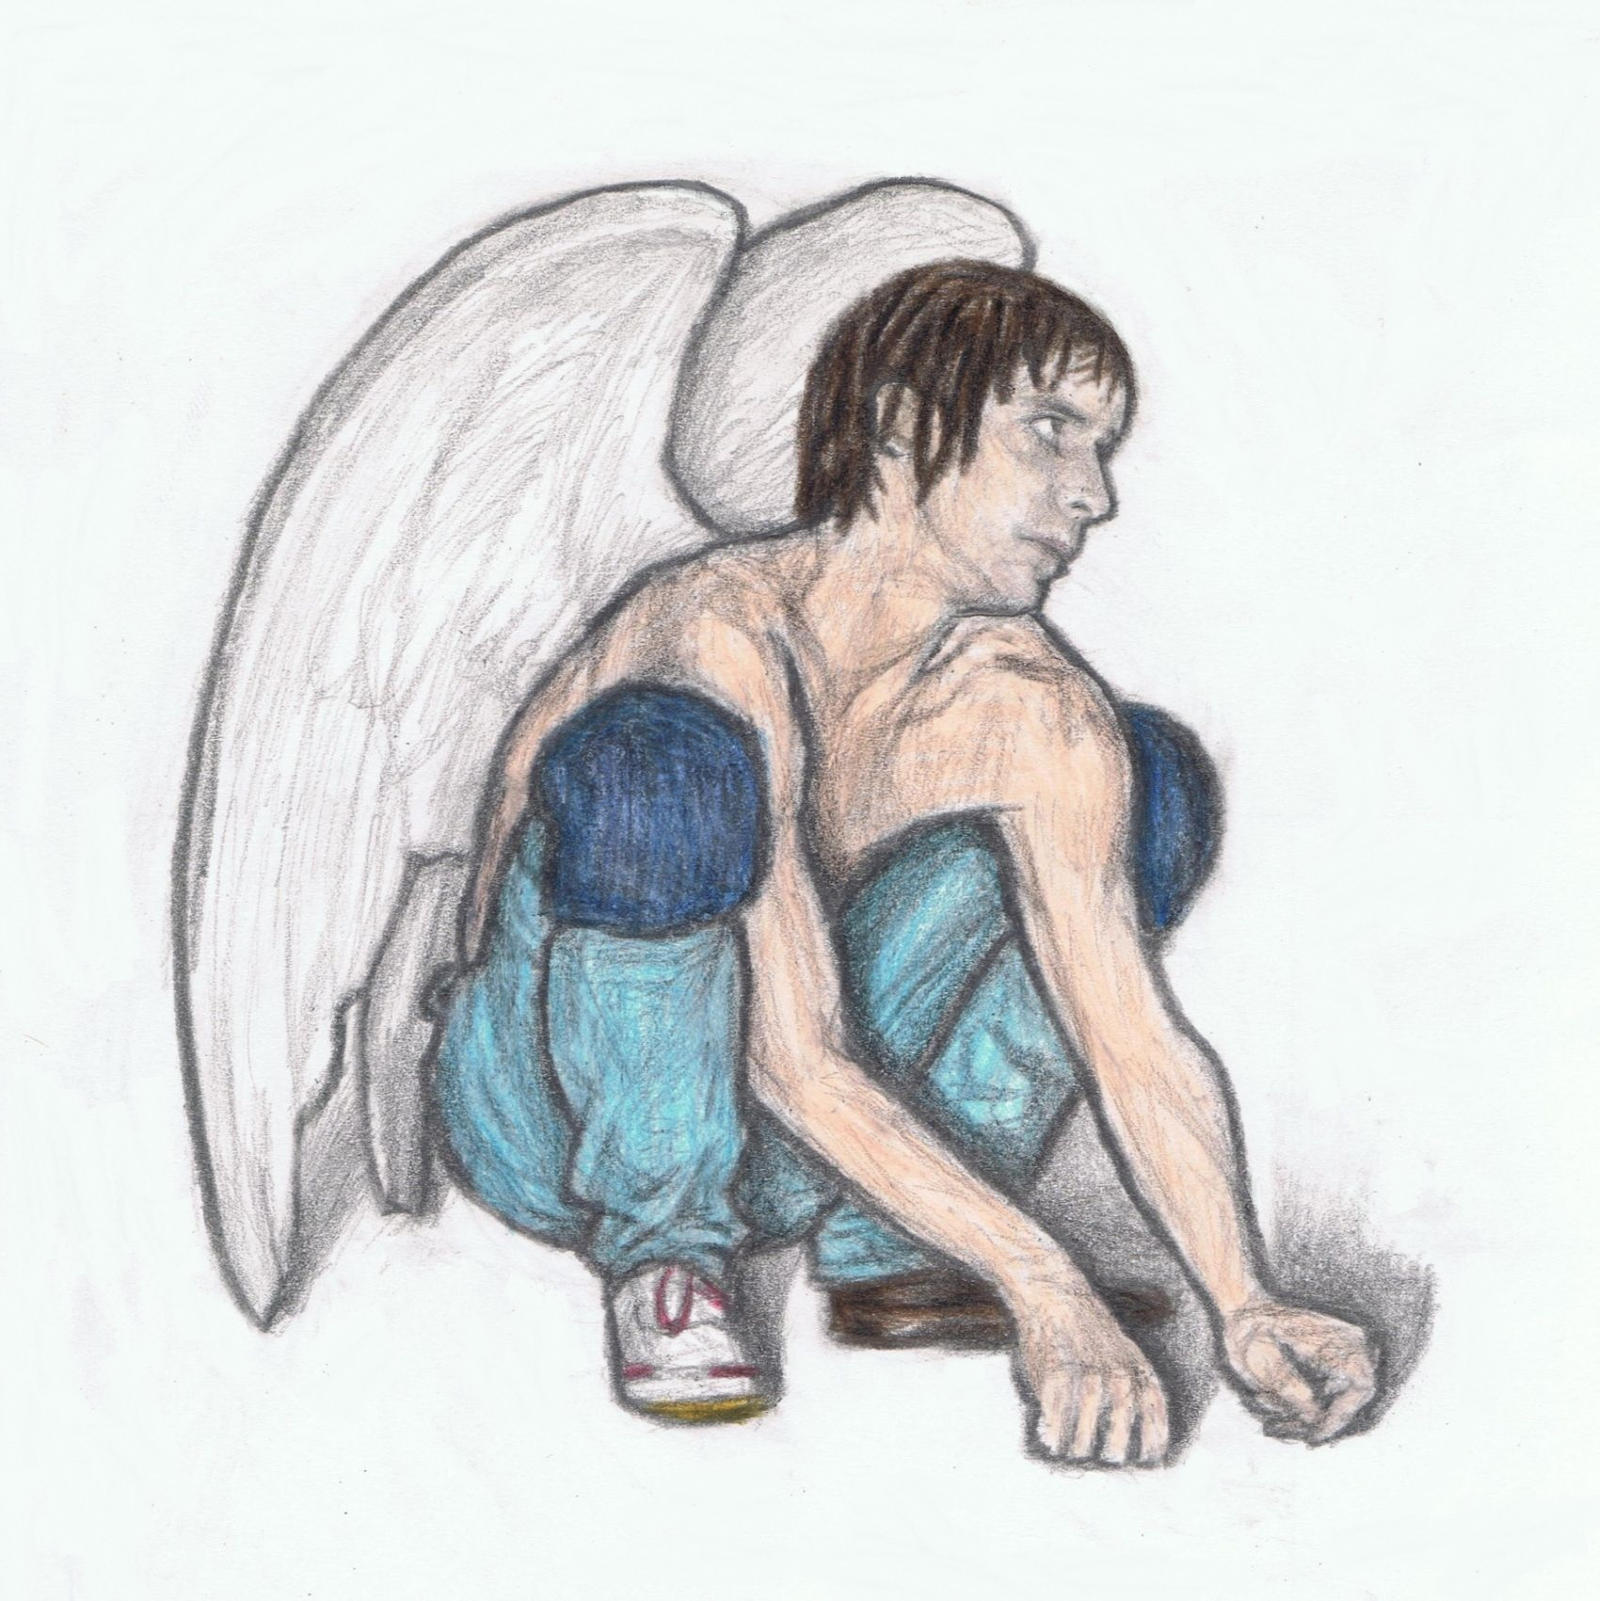 Iggy Pop as an angel by gagambo